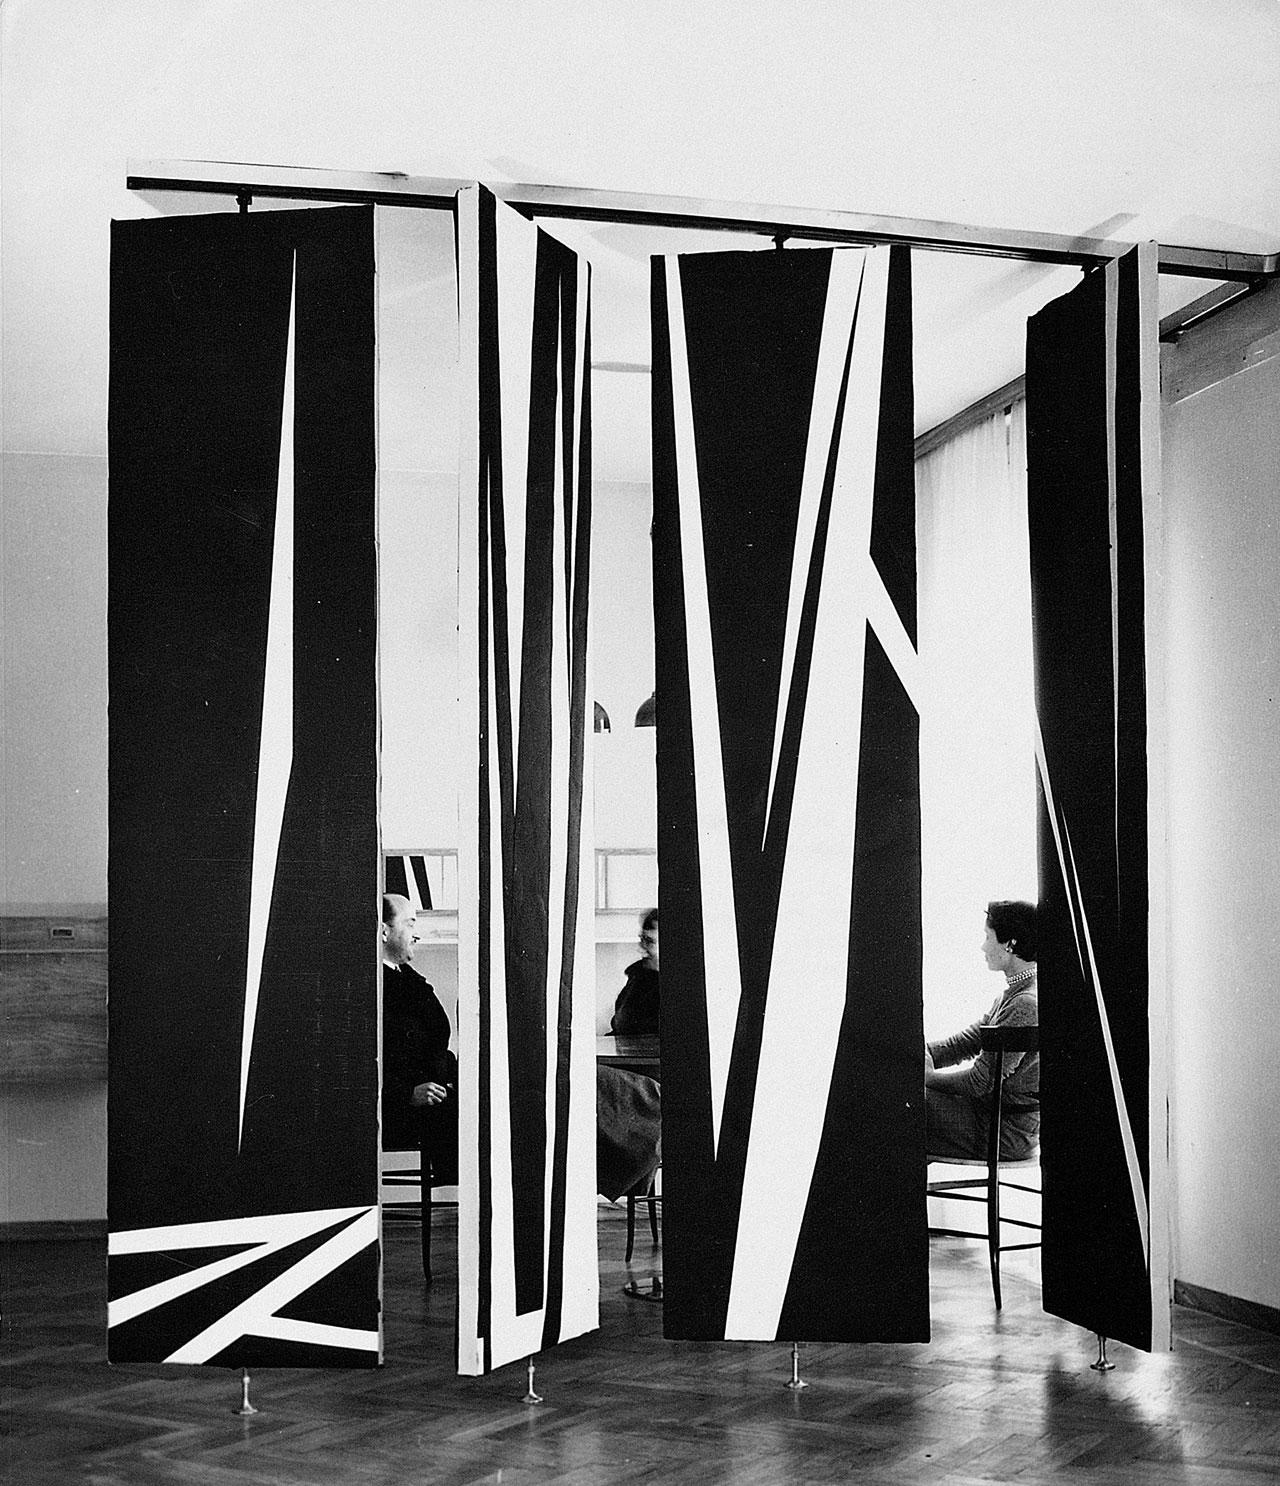 Appartamento Bignardi, Milano, 1952© Agape